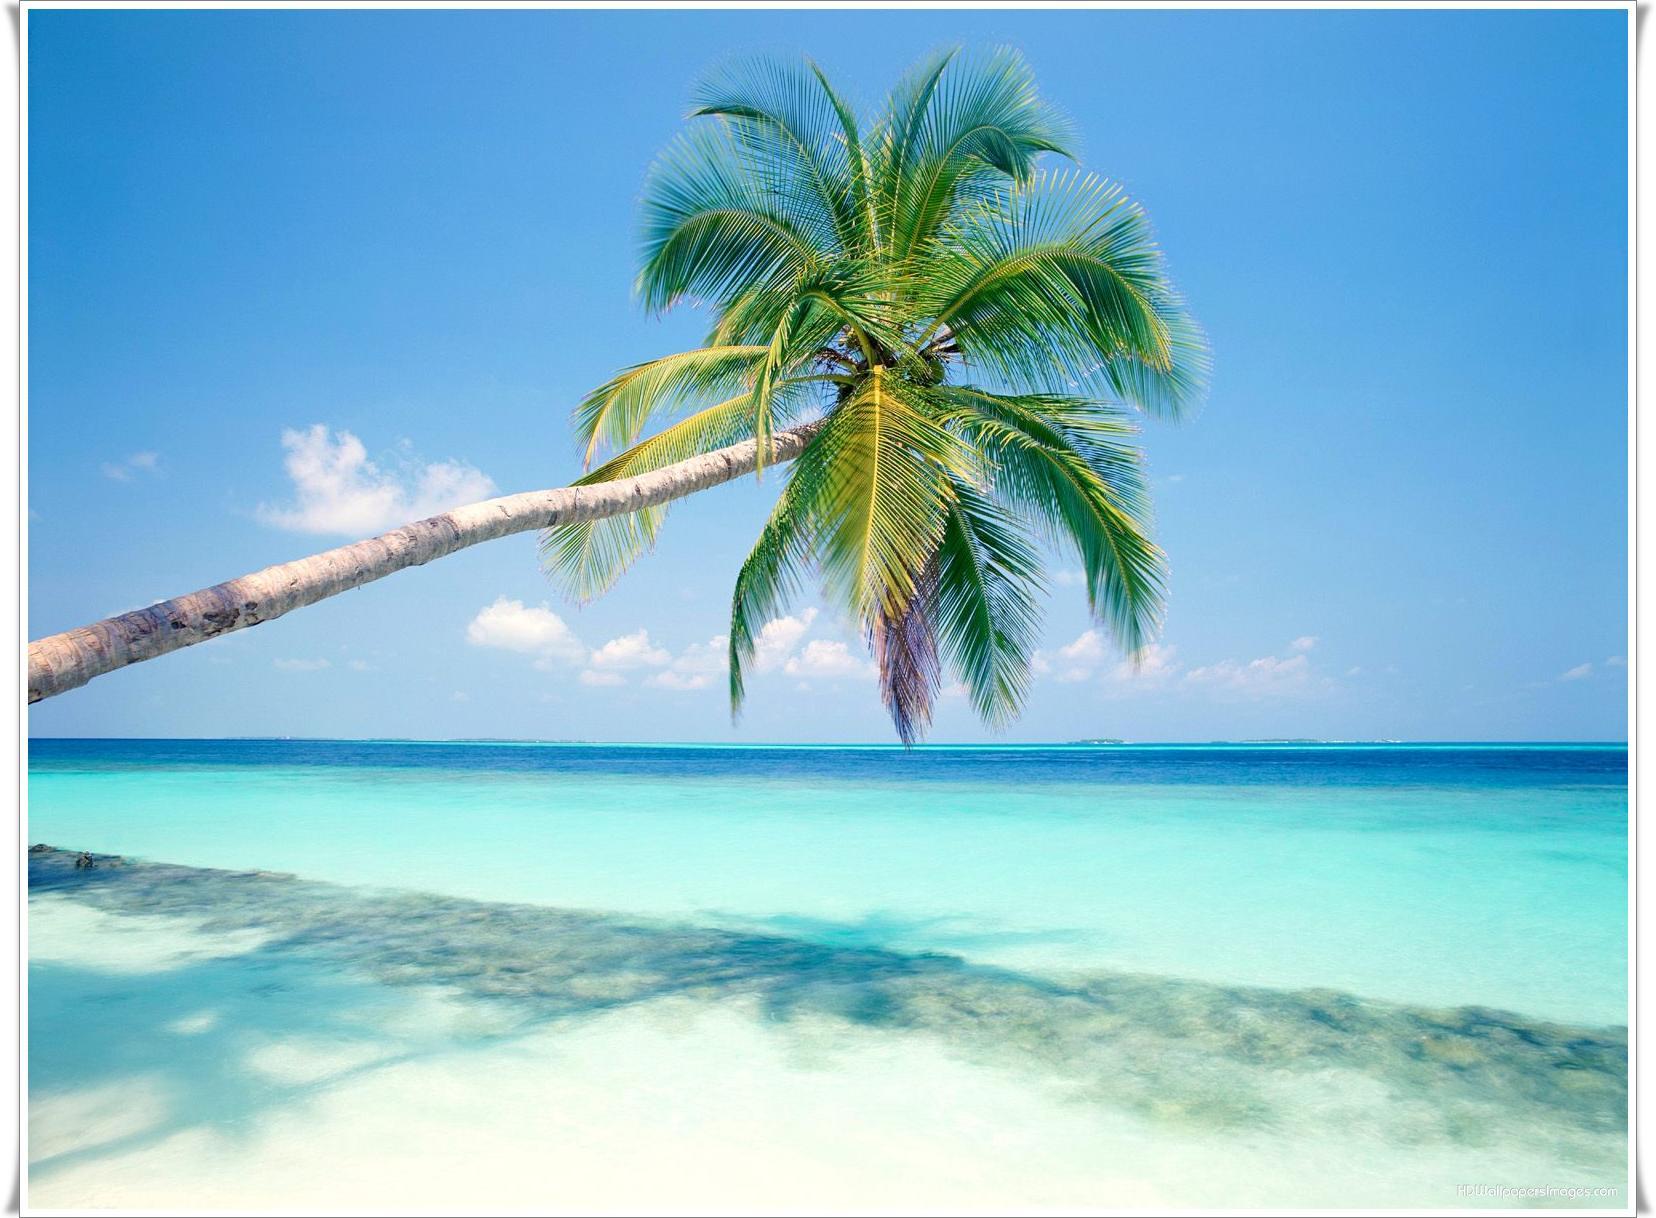 High Quality Goa Beach Wallpaper Full HD Pictures 1656x1218